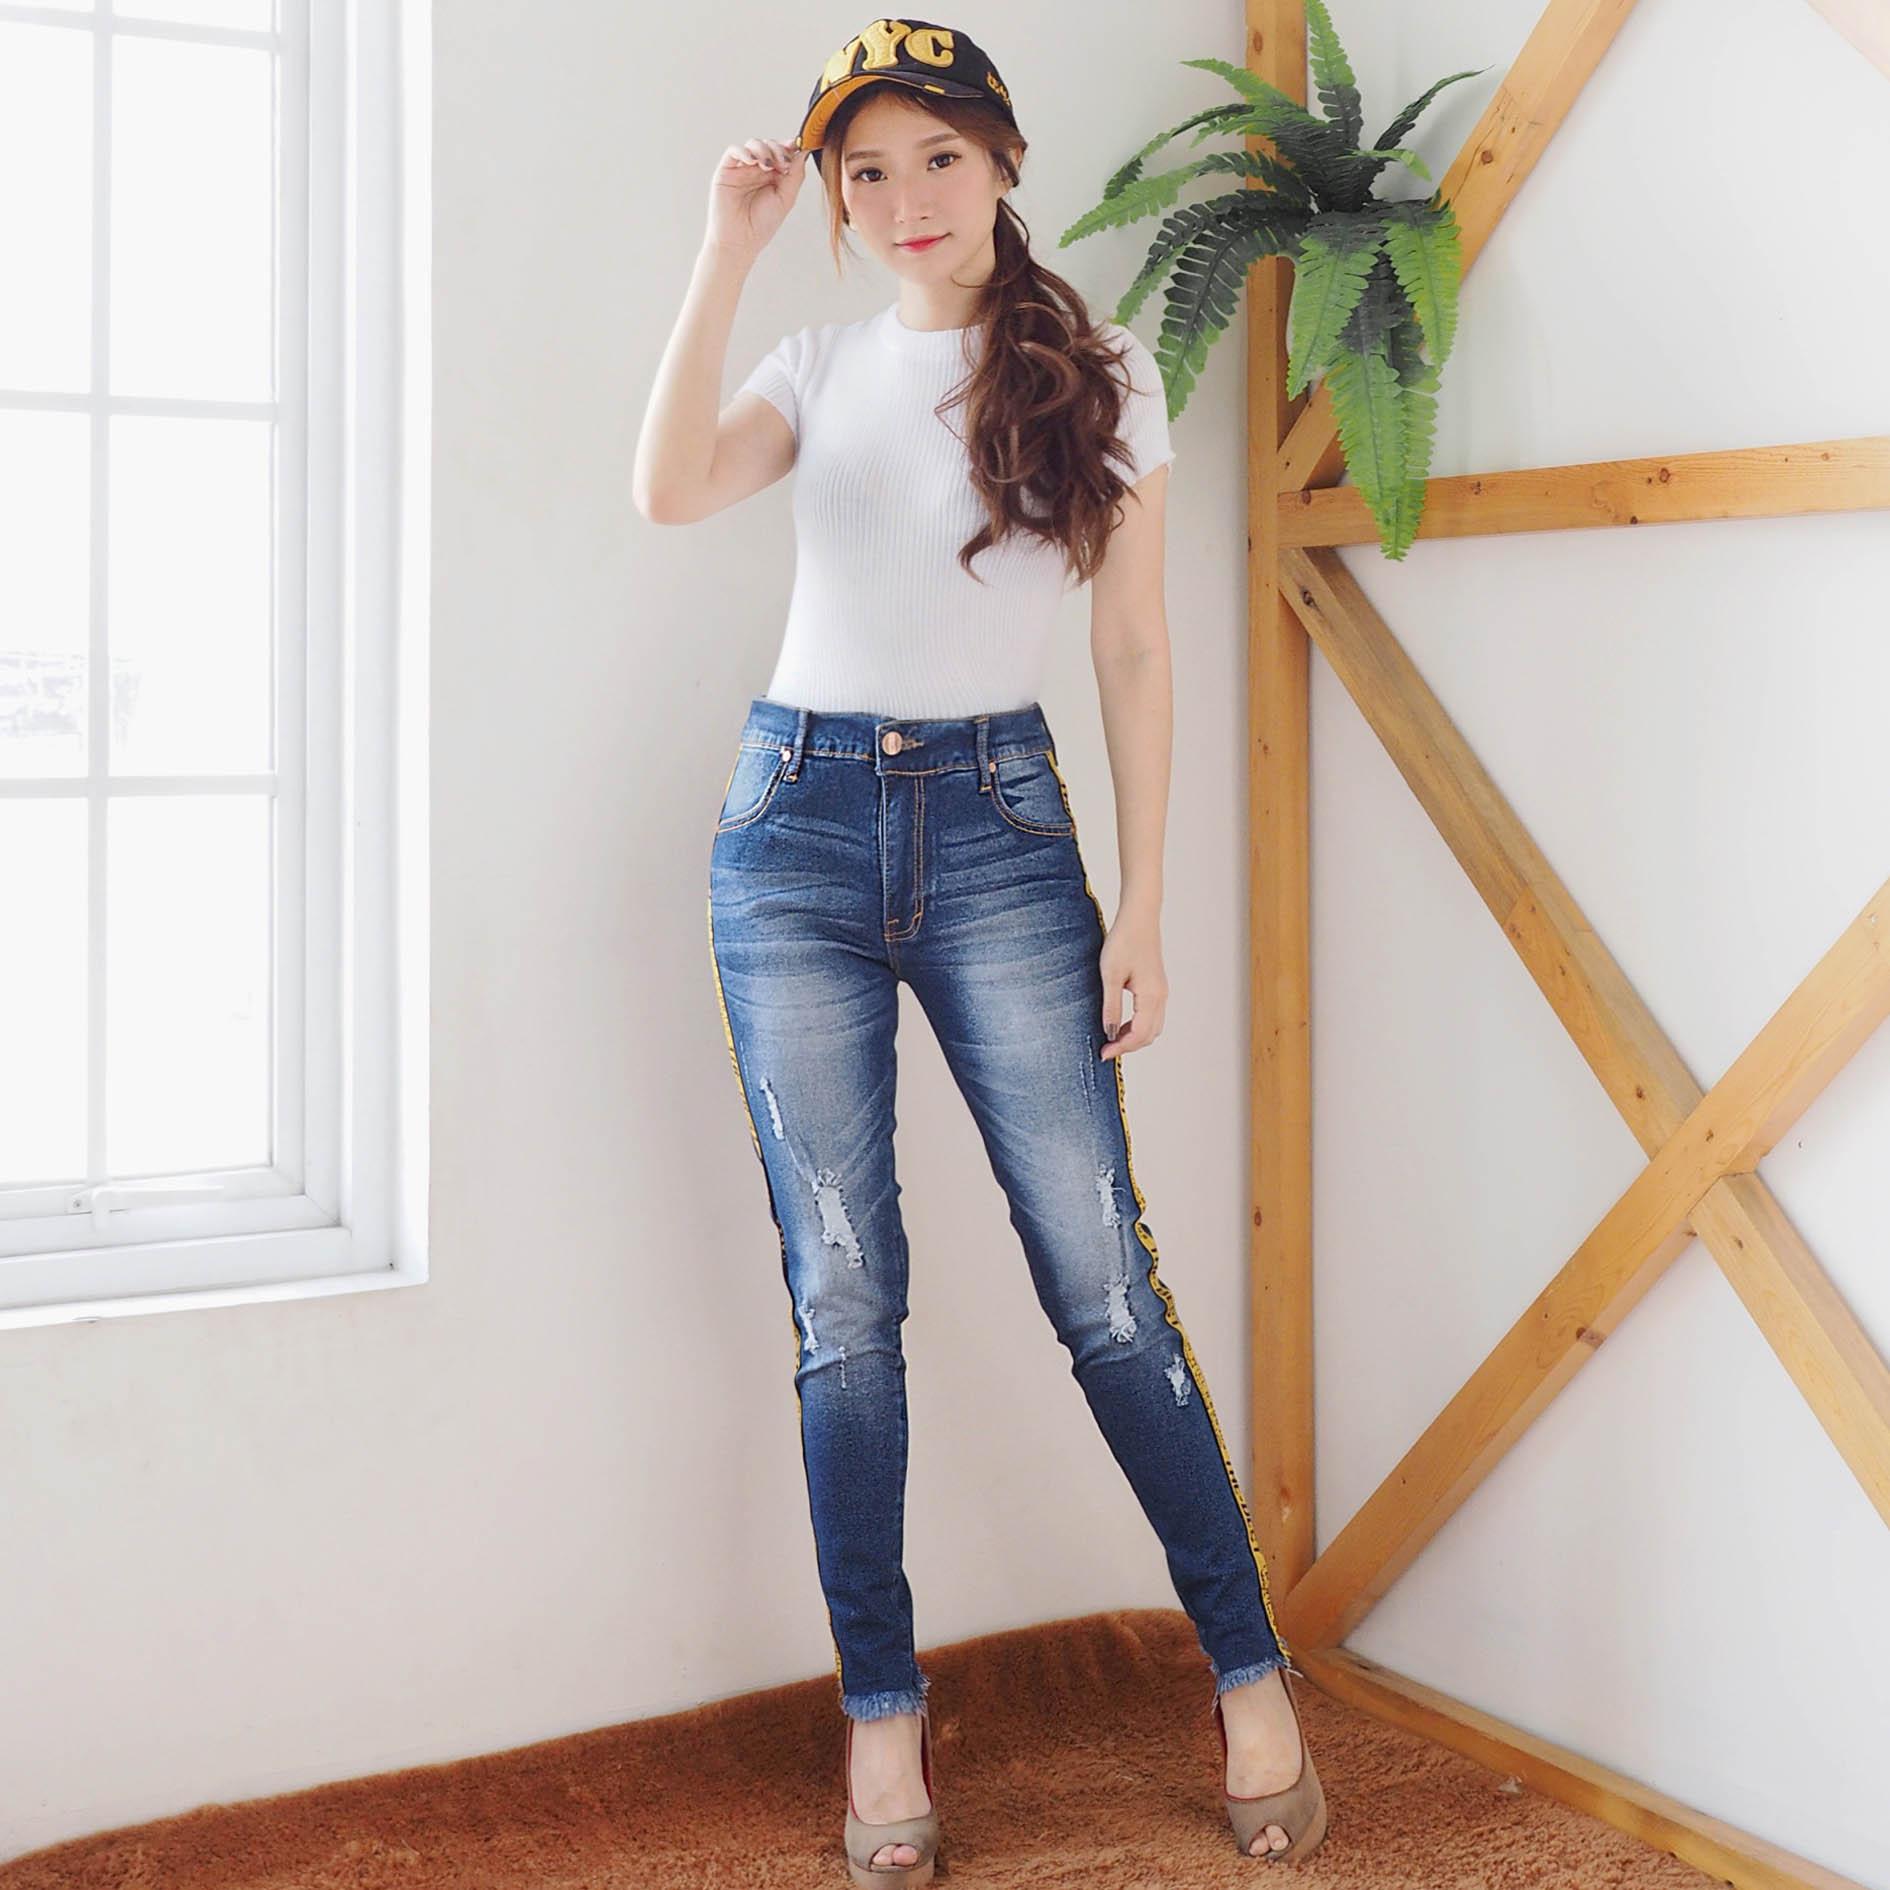 ... Celana Bigsize jeans Jumbo Wanita - Celana List kombinasi DMD - BEST SELLER - (available